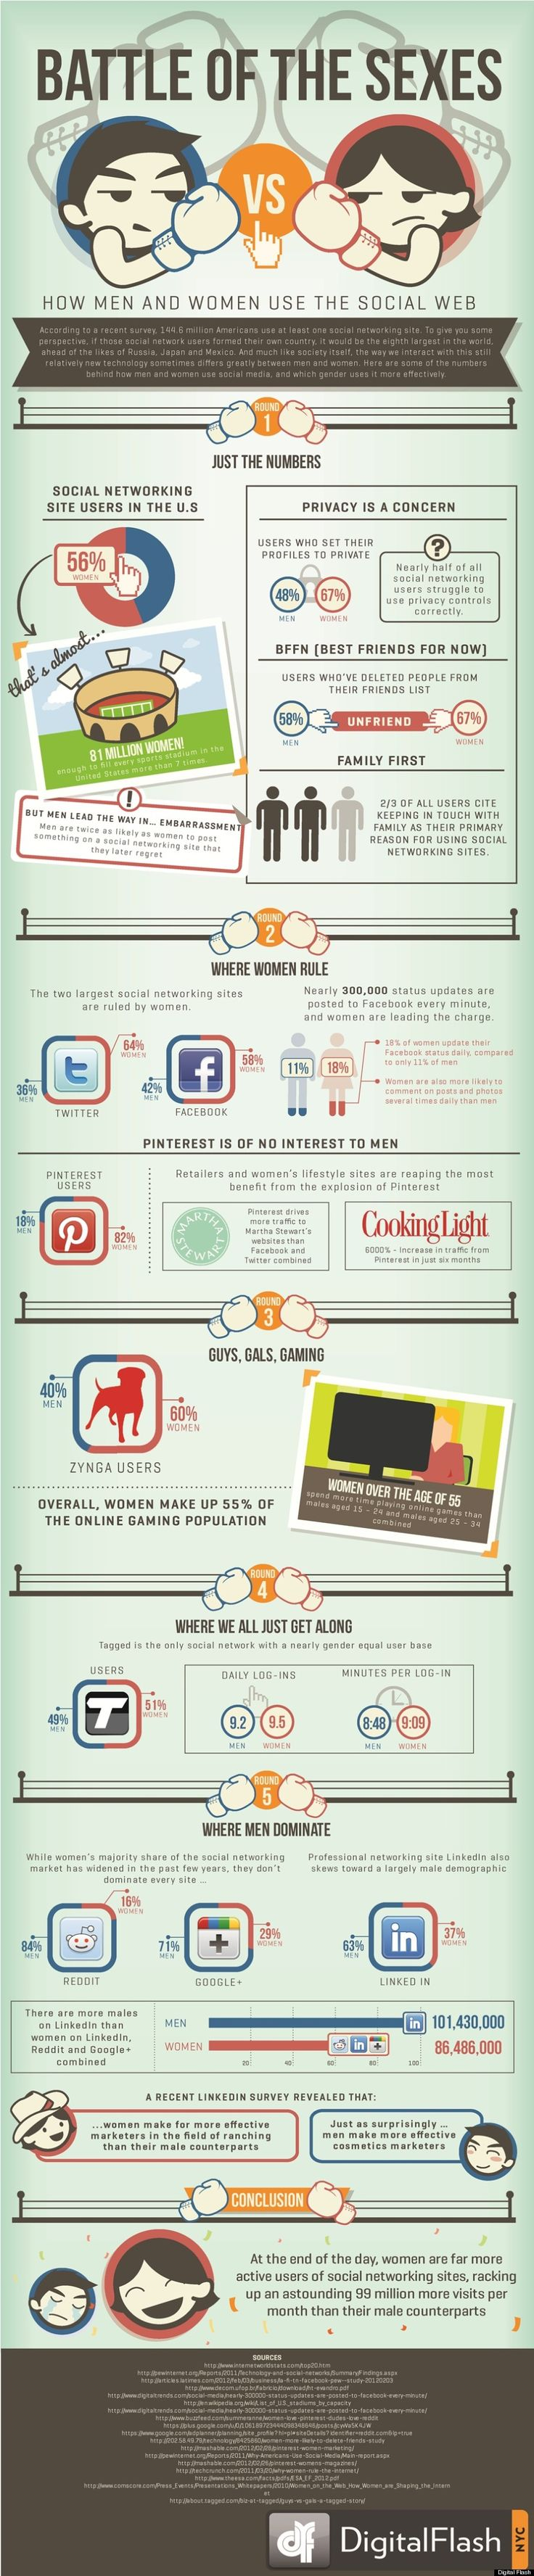 Battle of the sexes - Social Media 2012